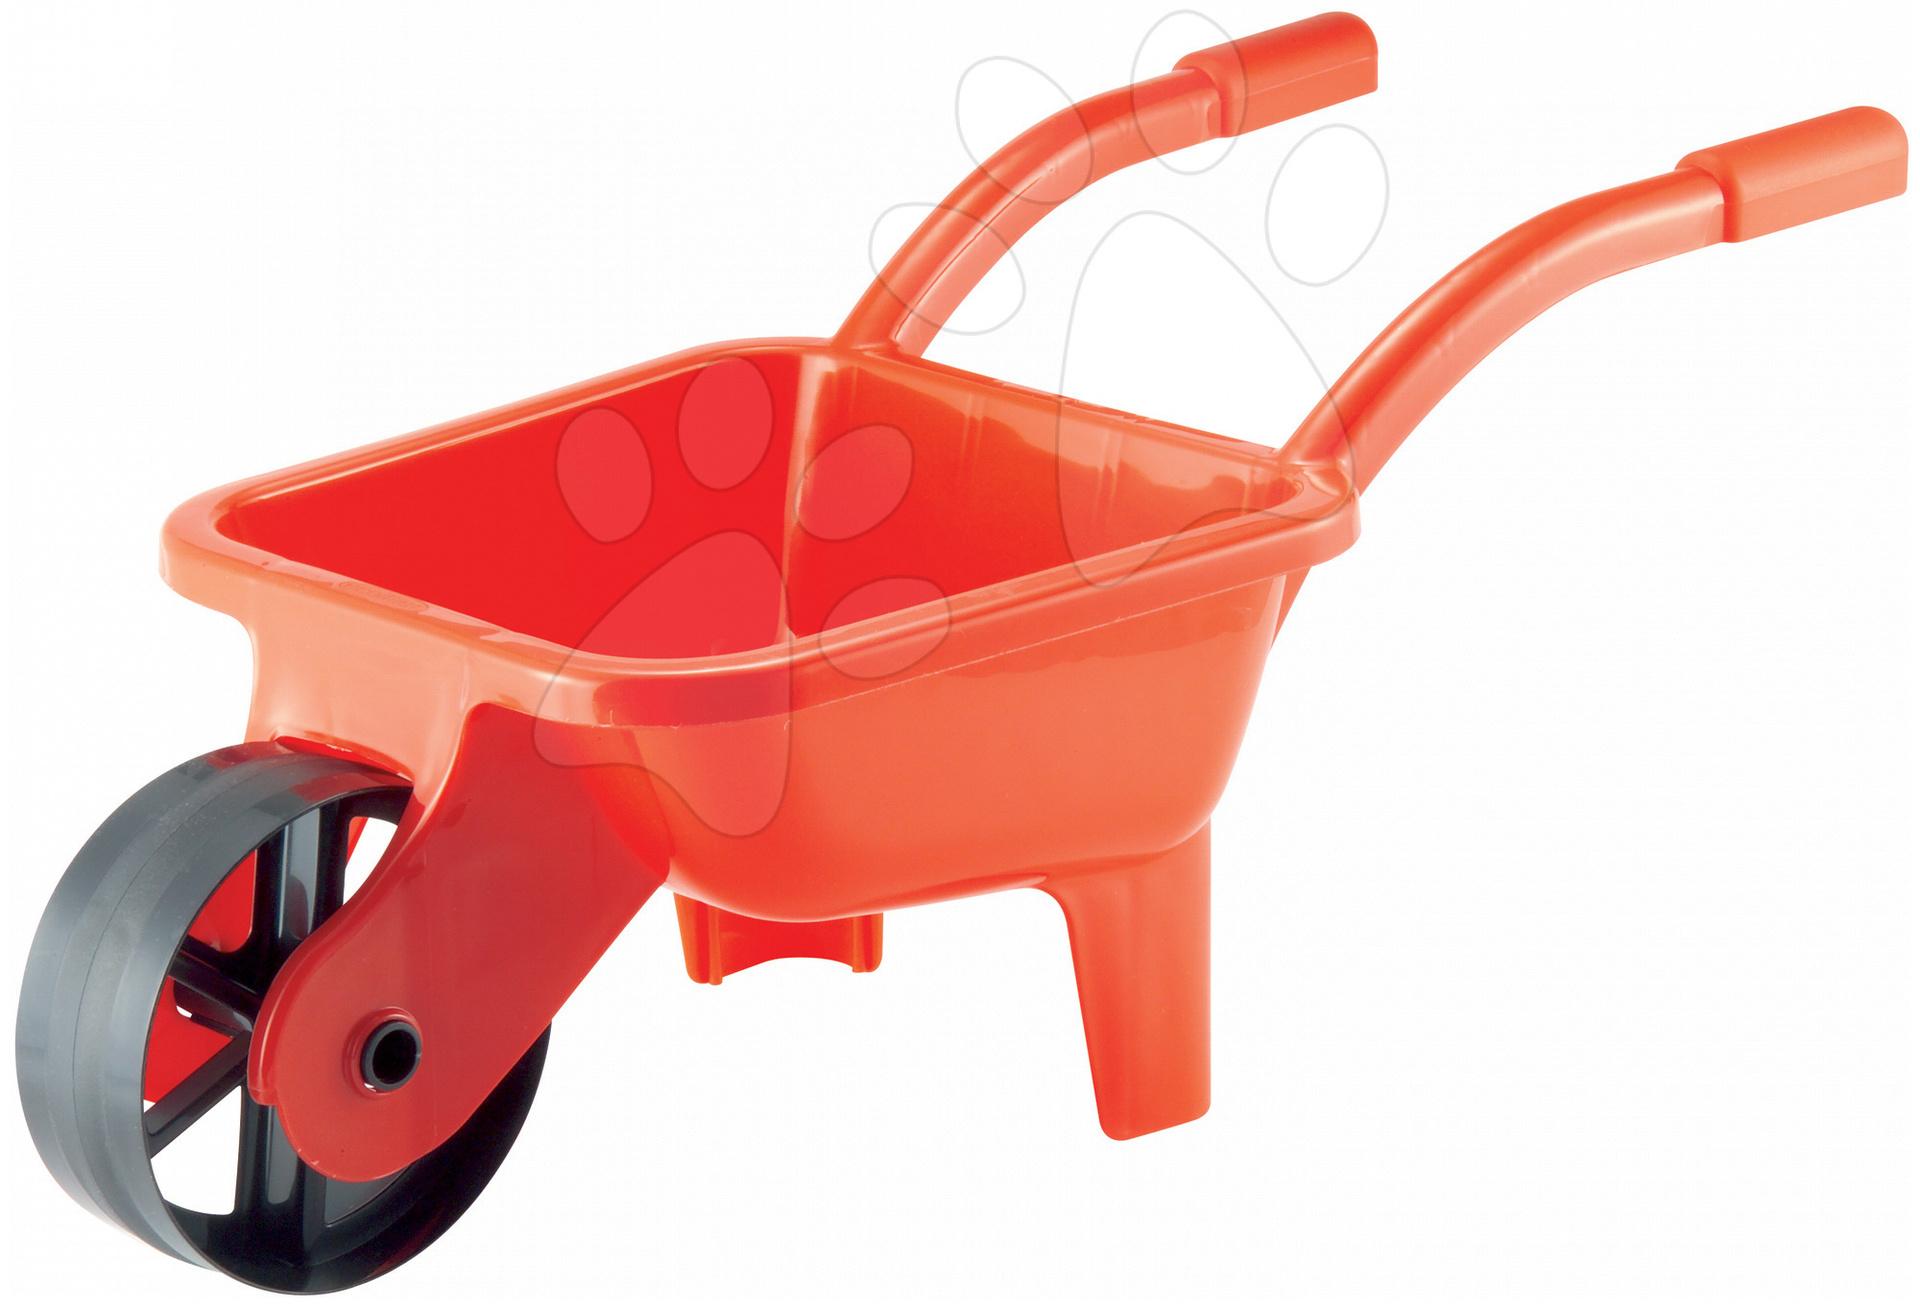 Samokolnice za pesek - Samokolnica Picnic Écoiffier (dolžina 66 cm) rdeča od 18 mes